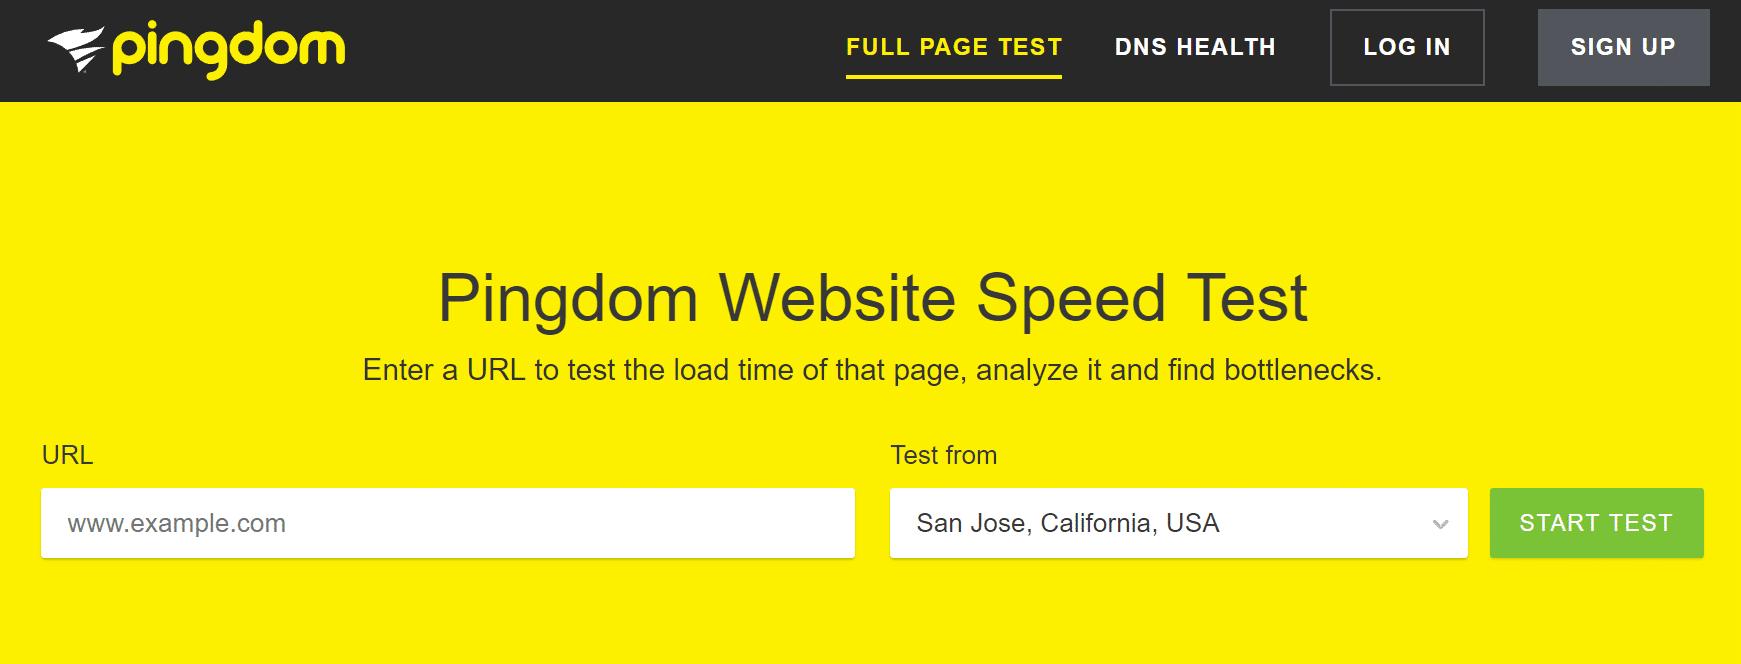 Test de vitesse de site web avec Pingdom